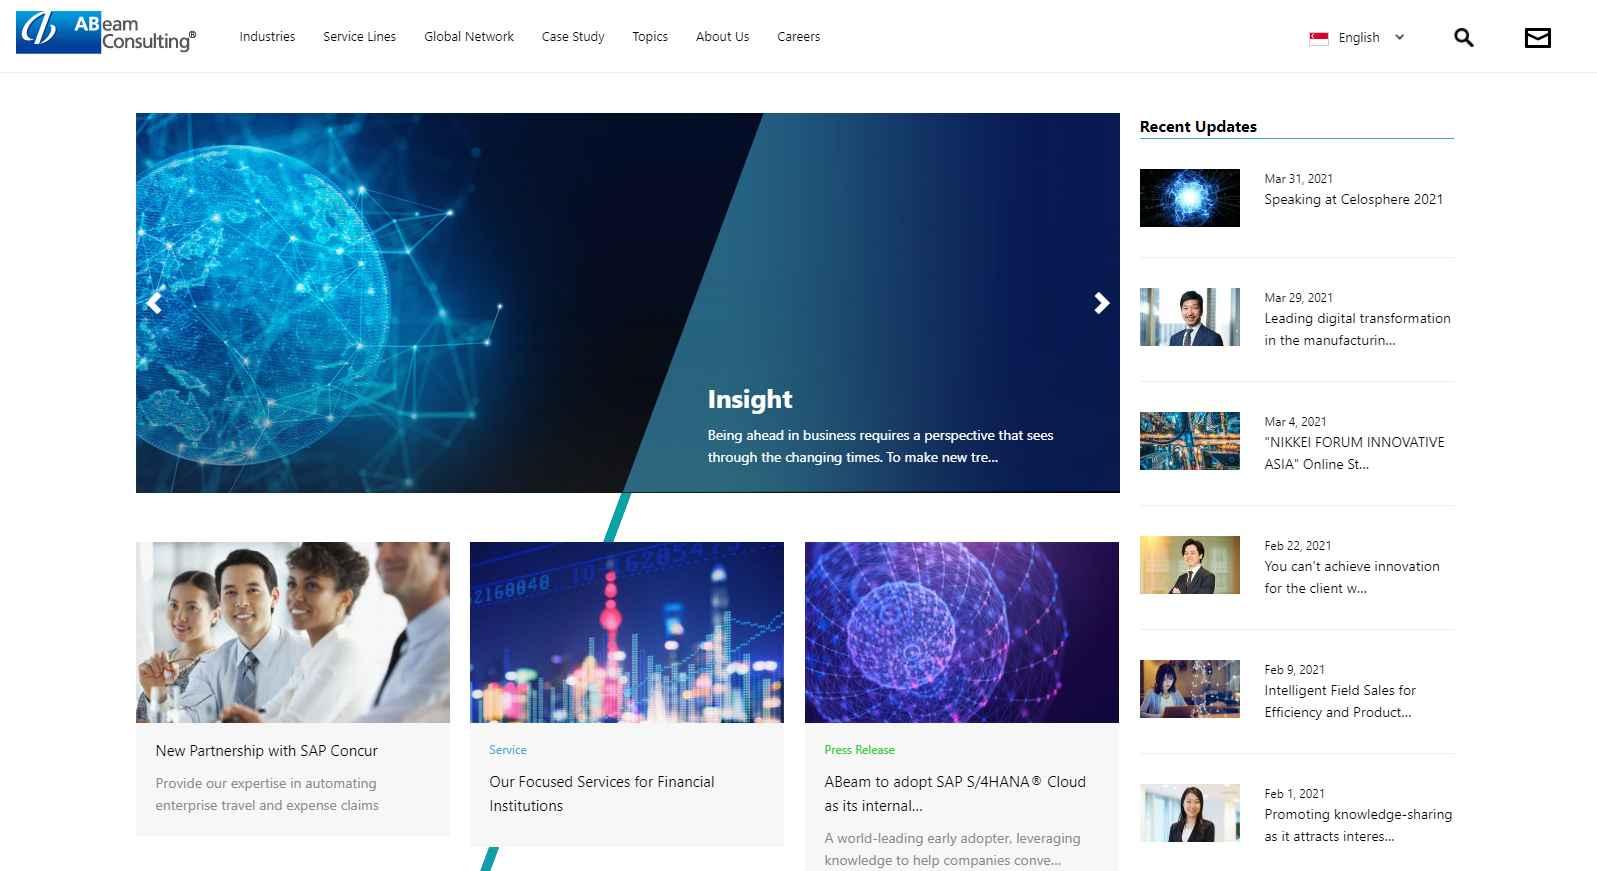 abeam Top Data Mining Service Providers in Singapore